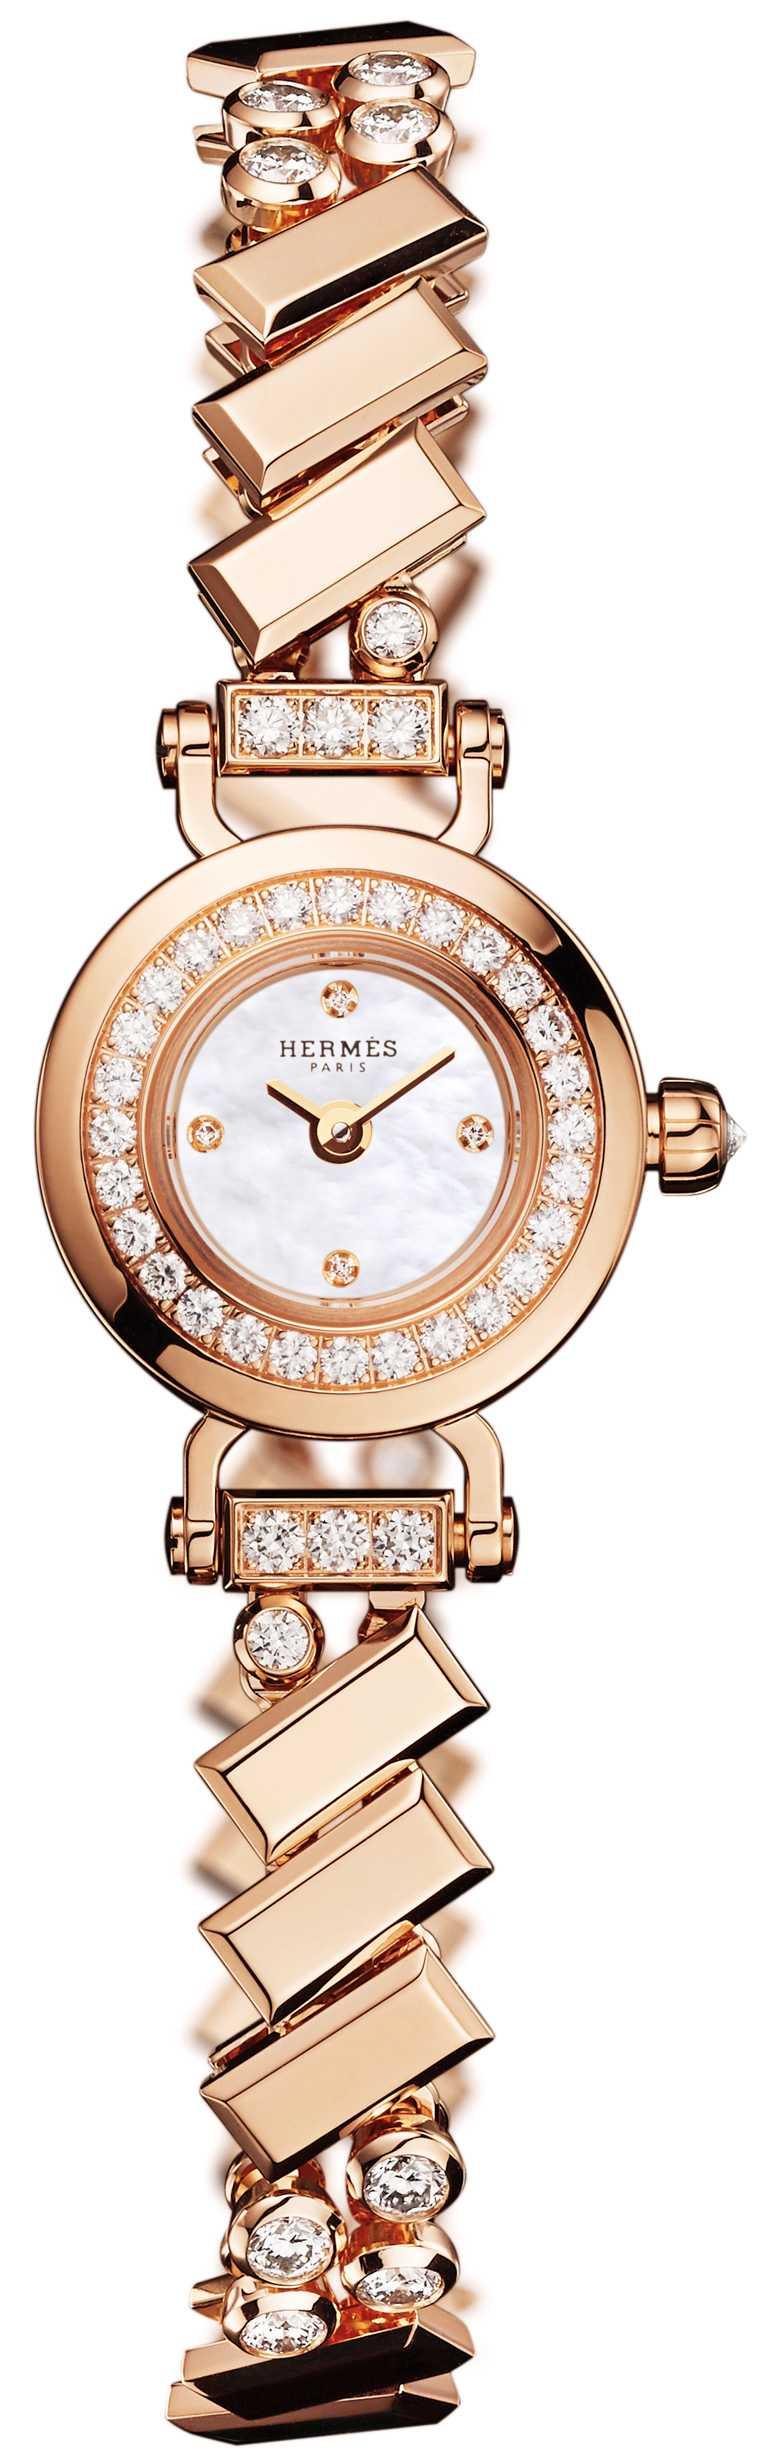 HERMÈS「Faubourg Polka」腕錶,玫瑰金錶殼,15.5mm,鑽石53顆╱價格未定。(圖╱HERMÈS提供)